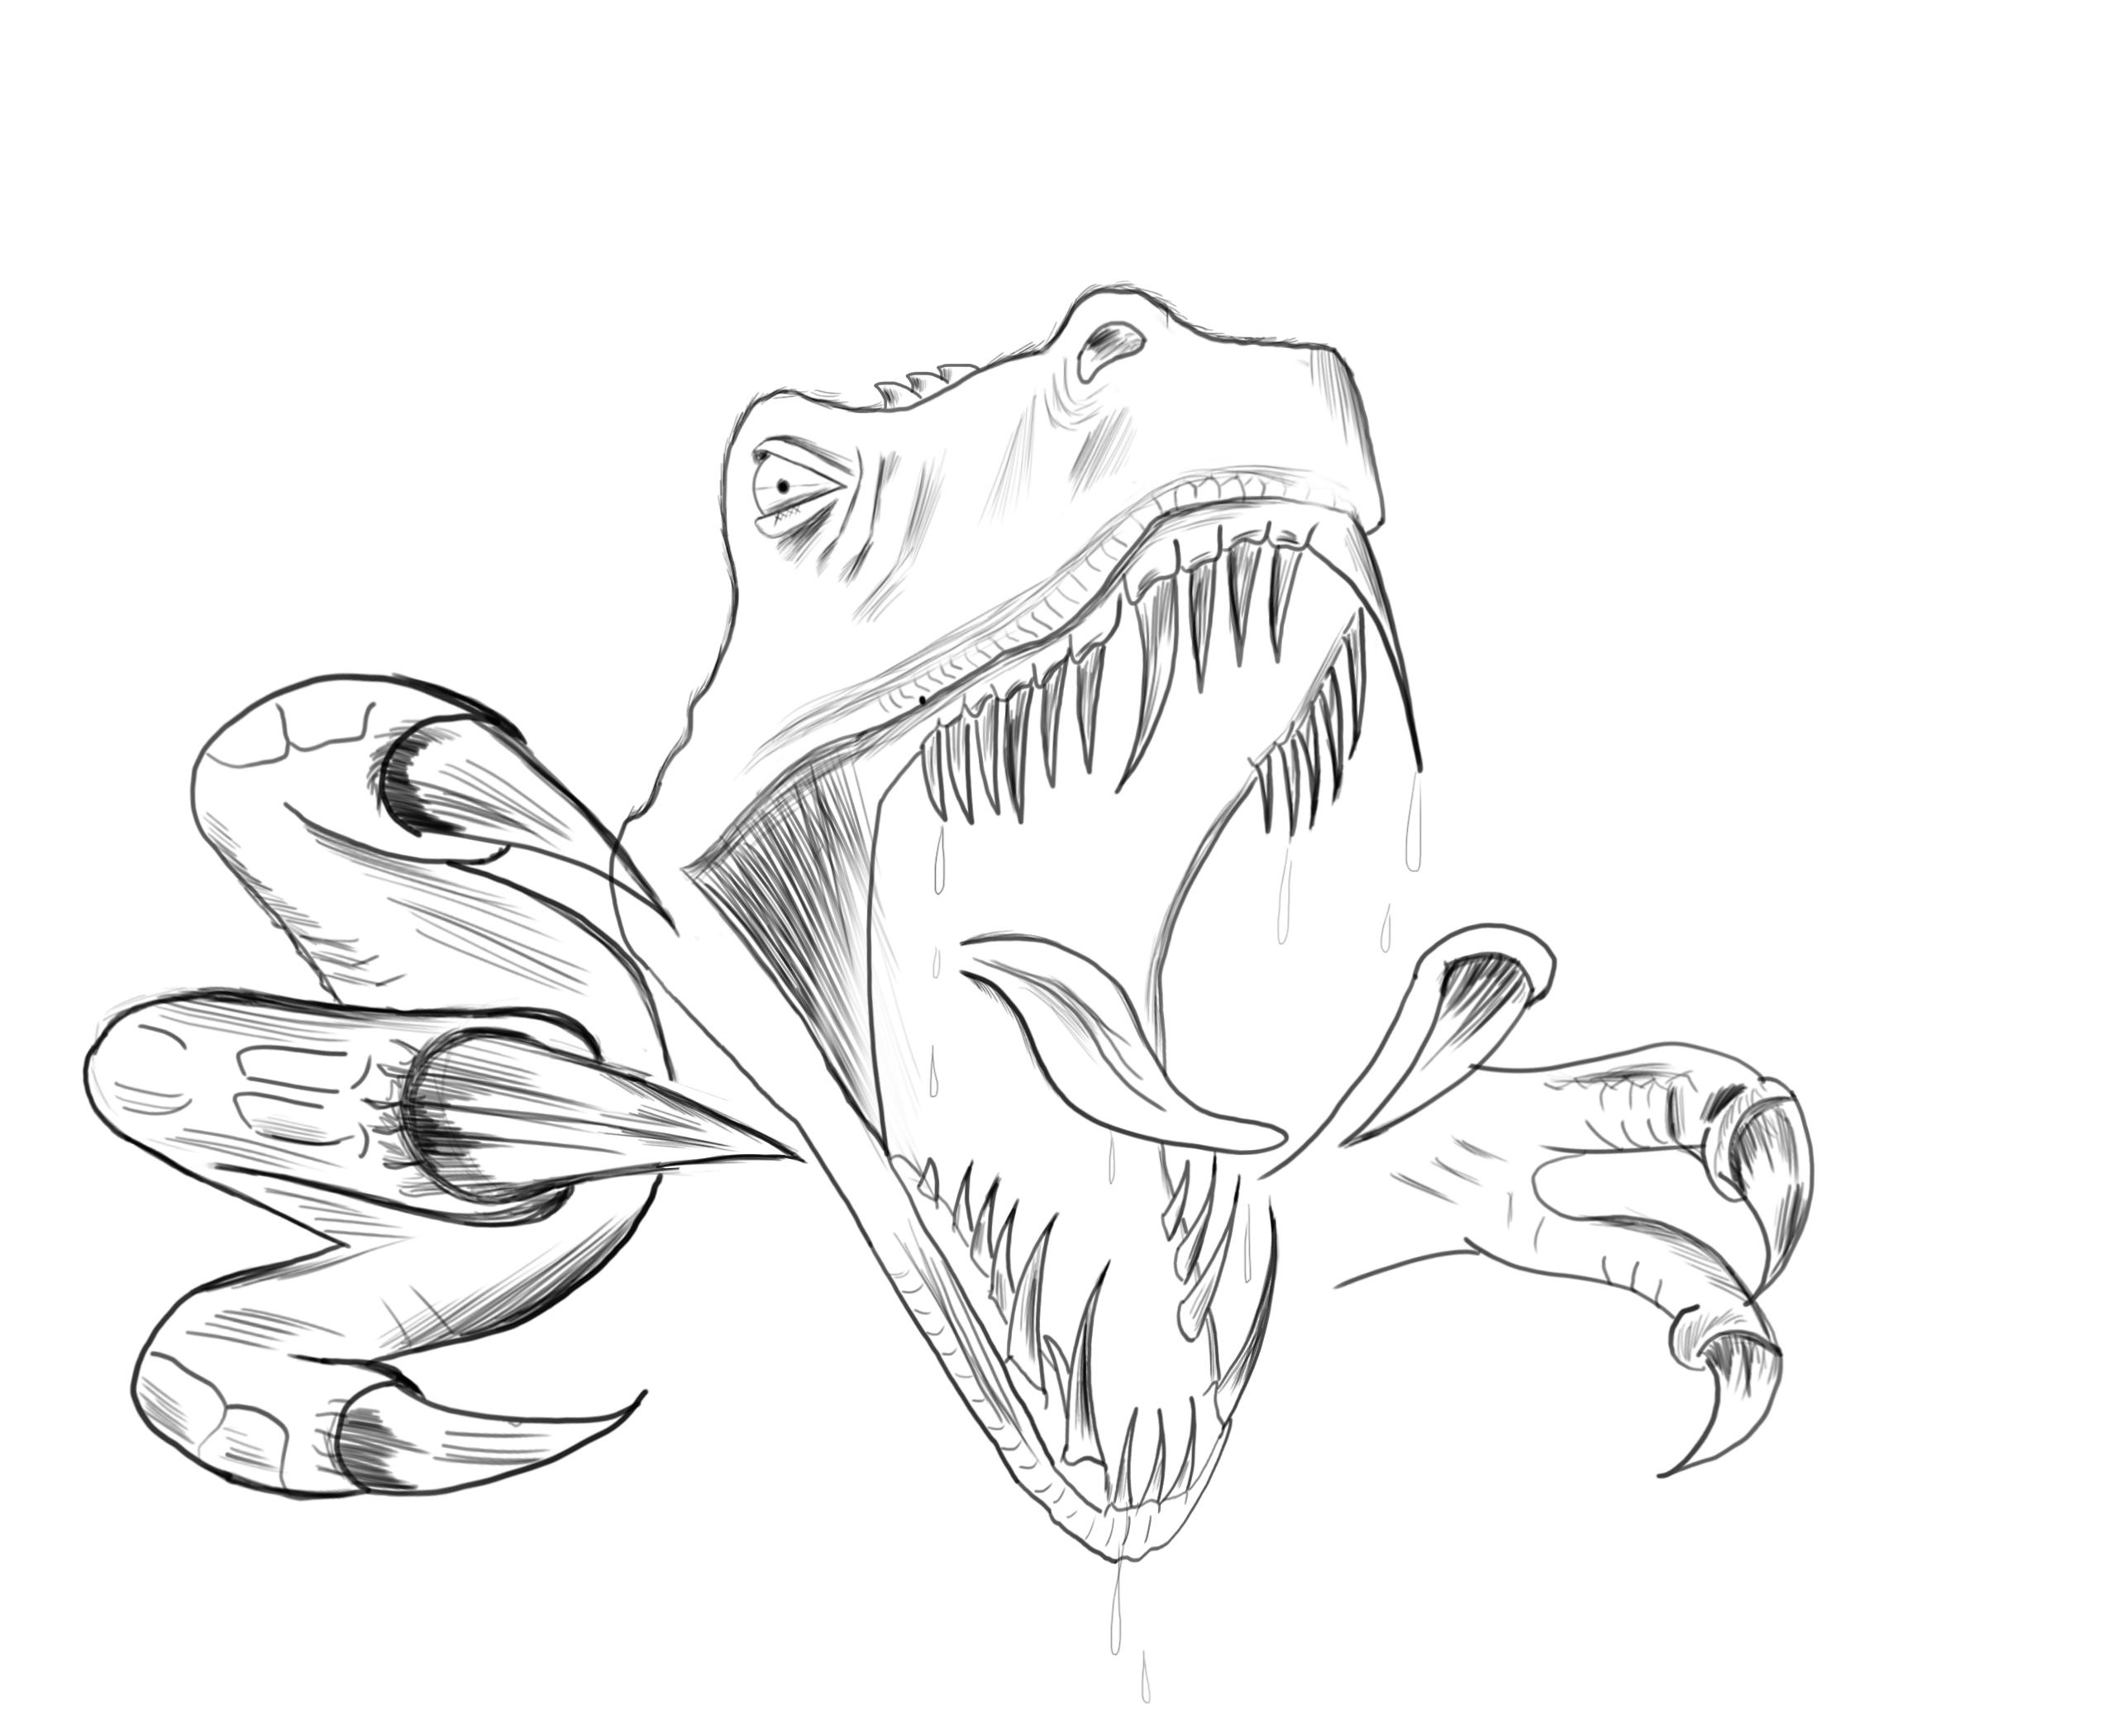 Coloriages imprimer t rex num ro 220089 - Dessin de tyrannosaure ...